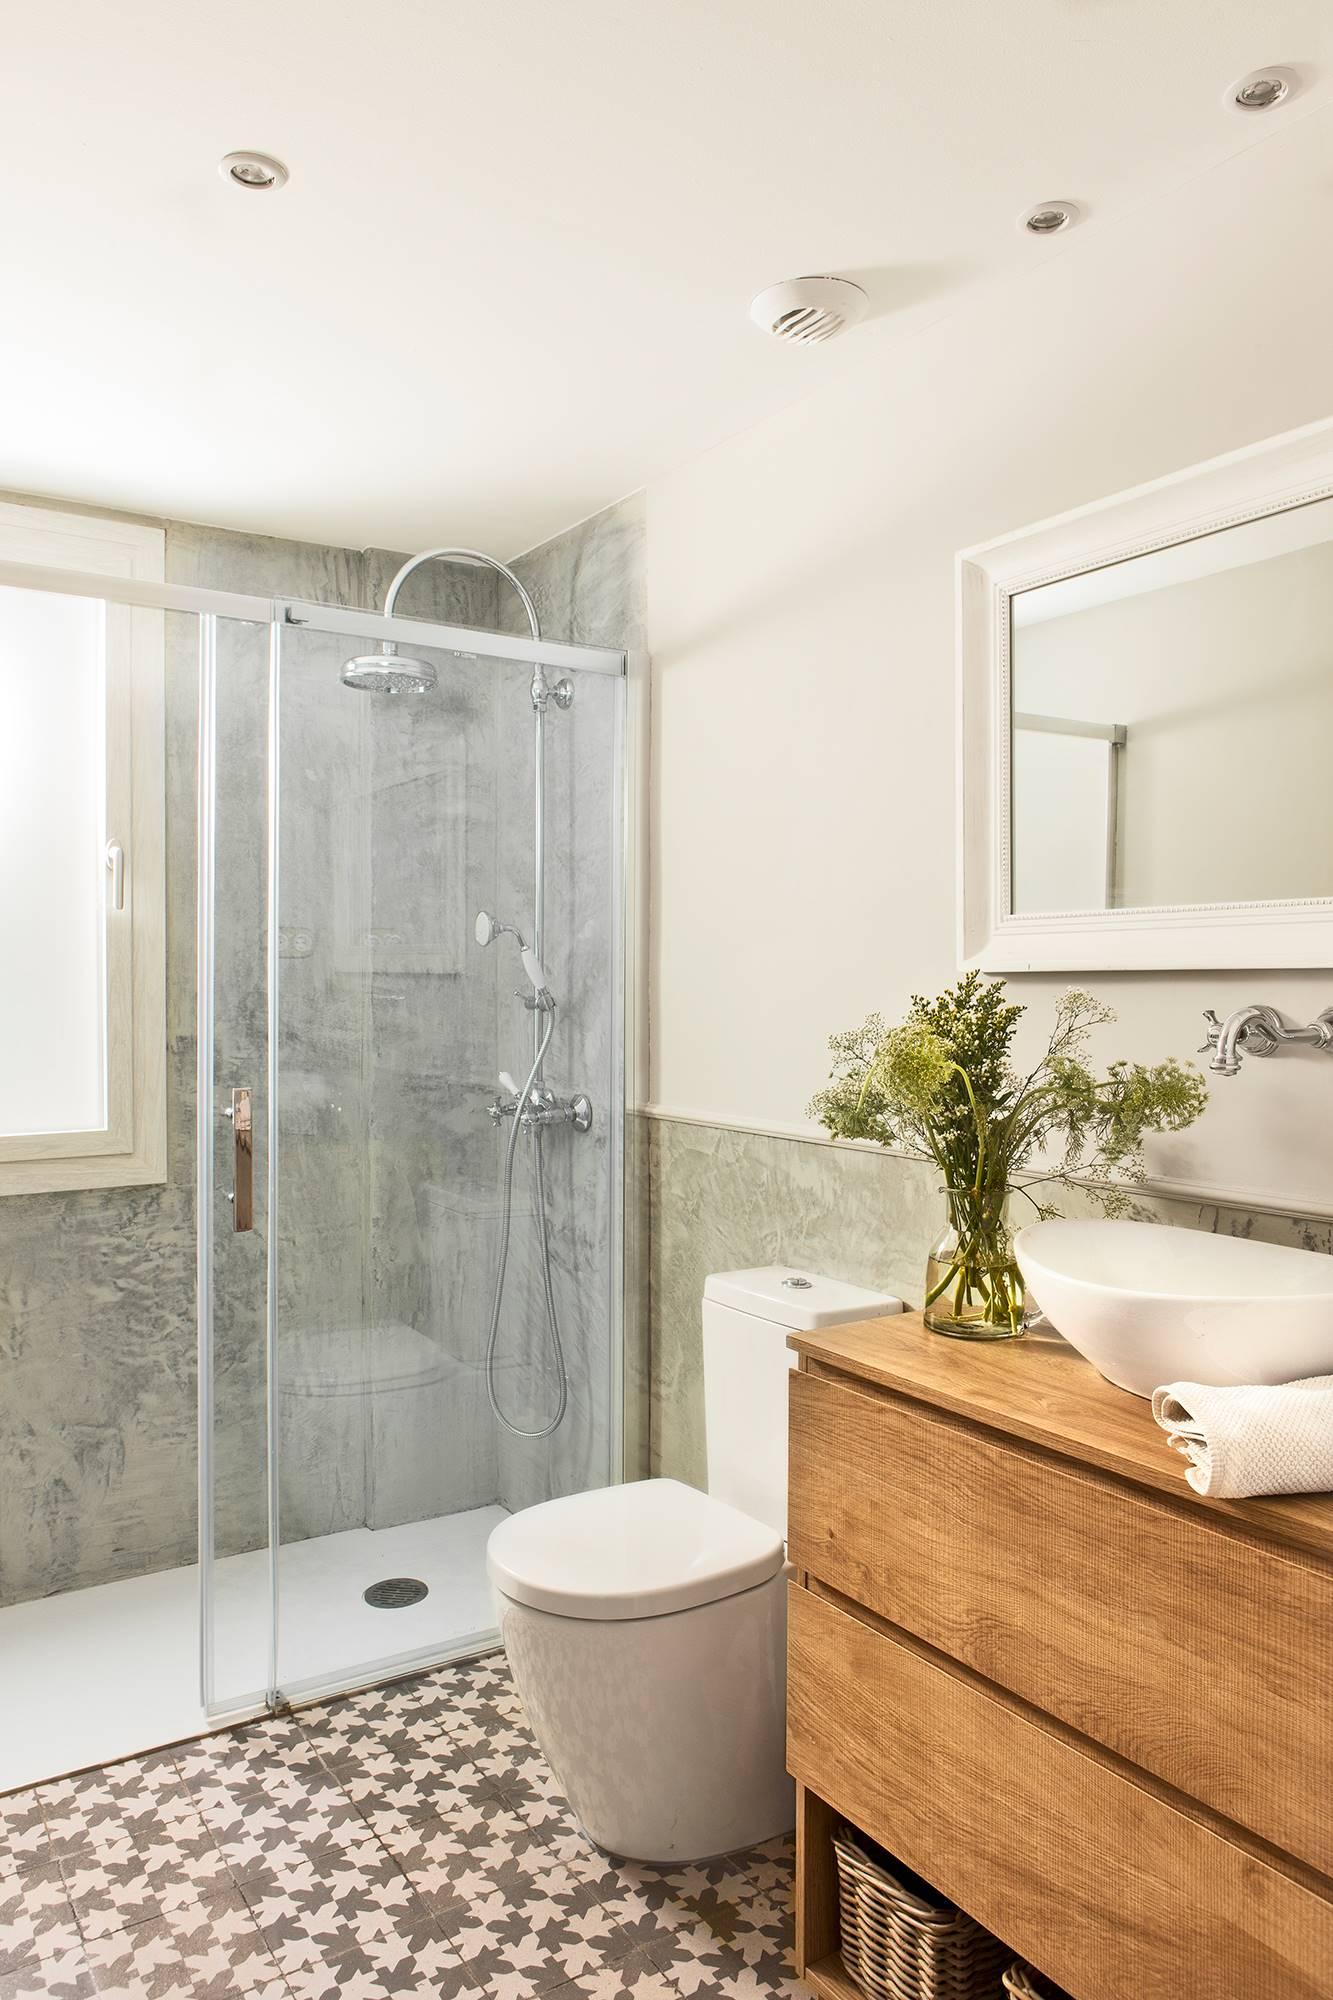 Platos de ducha a ras de suelo - Como instalar un plato de ducha acrilico ...